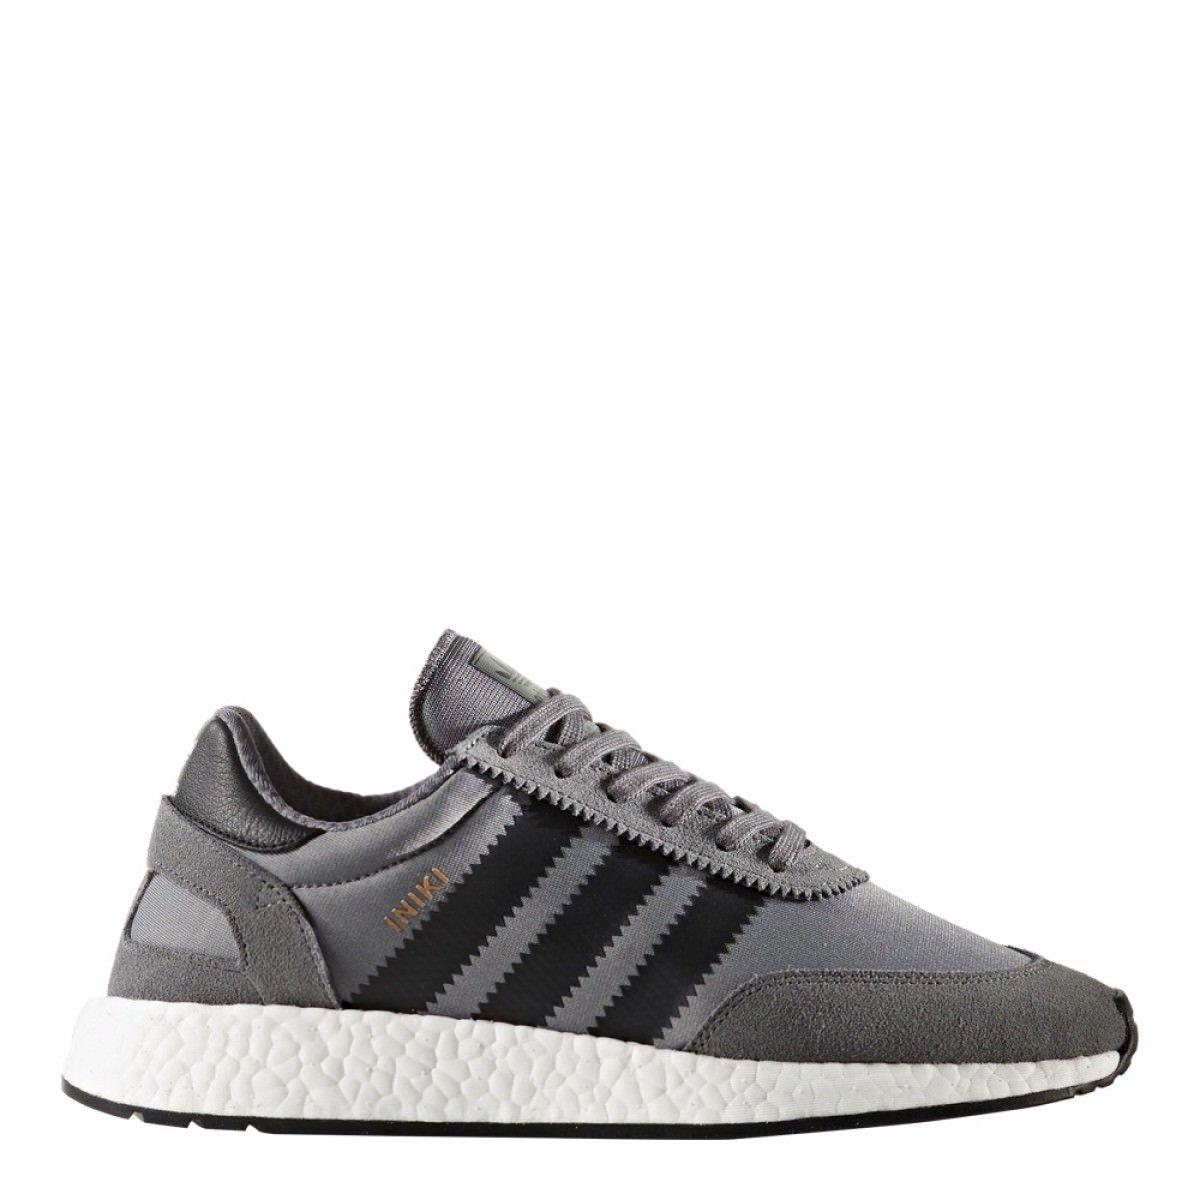 premium selection c64bf 46557 Amazon.com   adidas Iniki Runner   Shoes